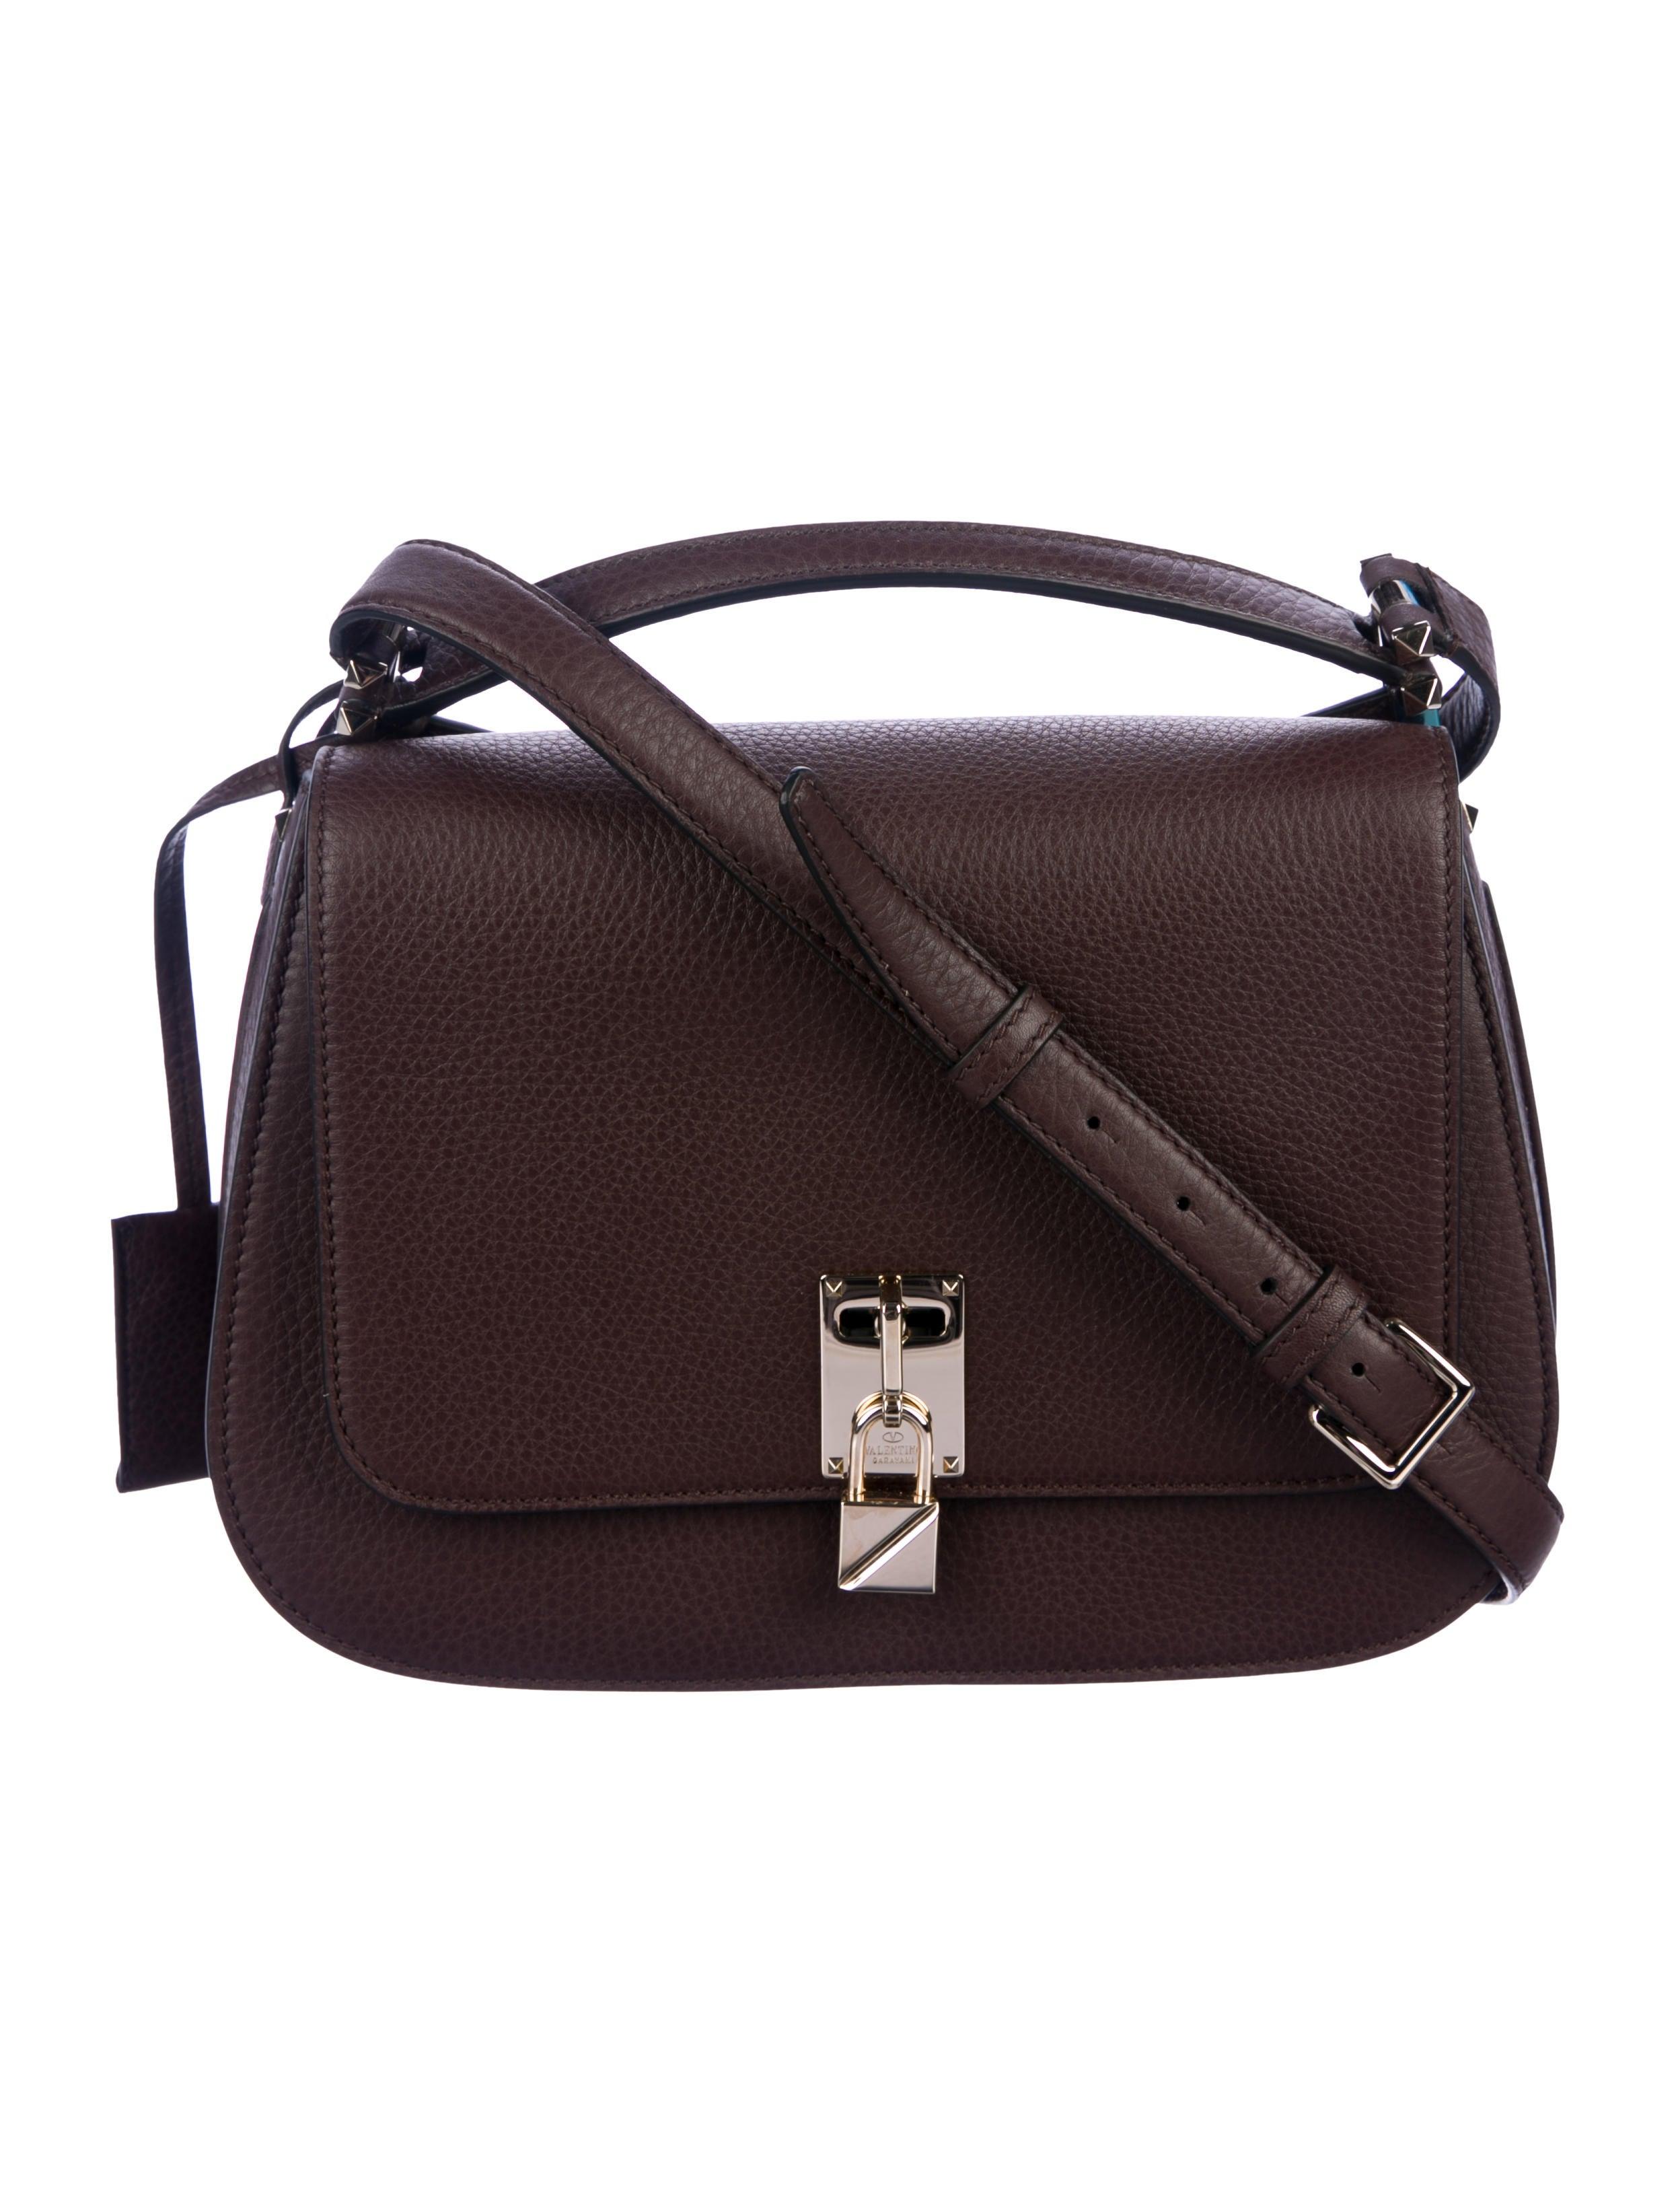 a3d52d66f9 Valentino 2017 Joylock Messenger Bag w  Tags - Handbags - VAL115631 ...